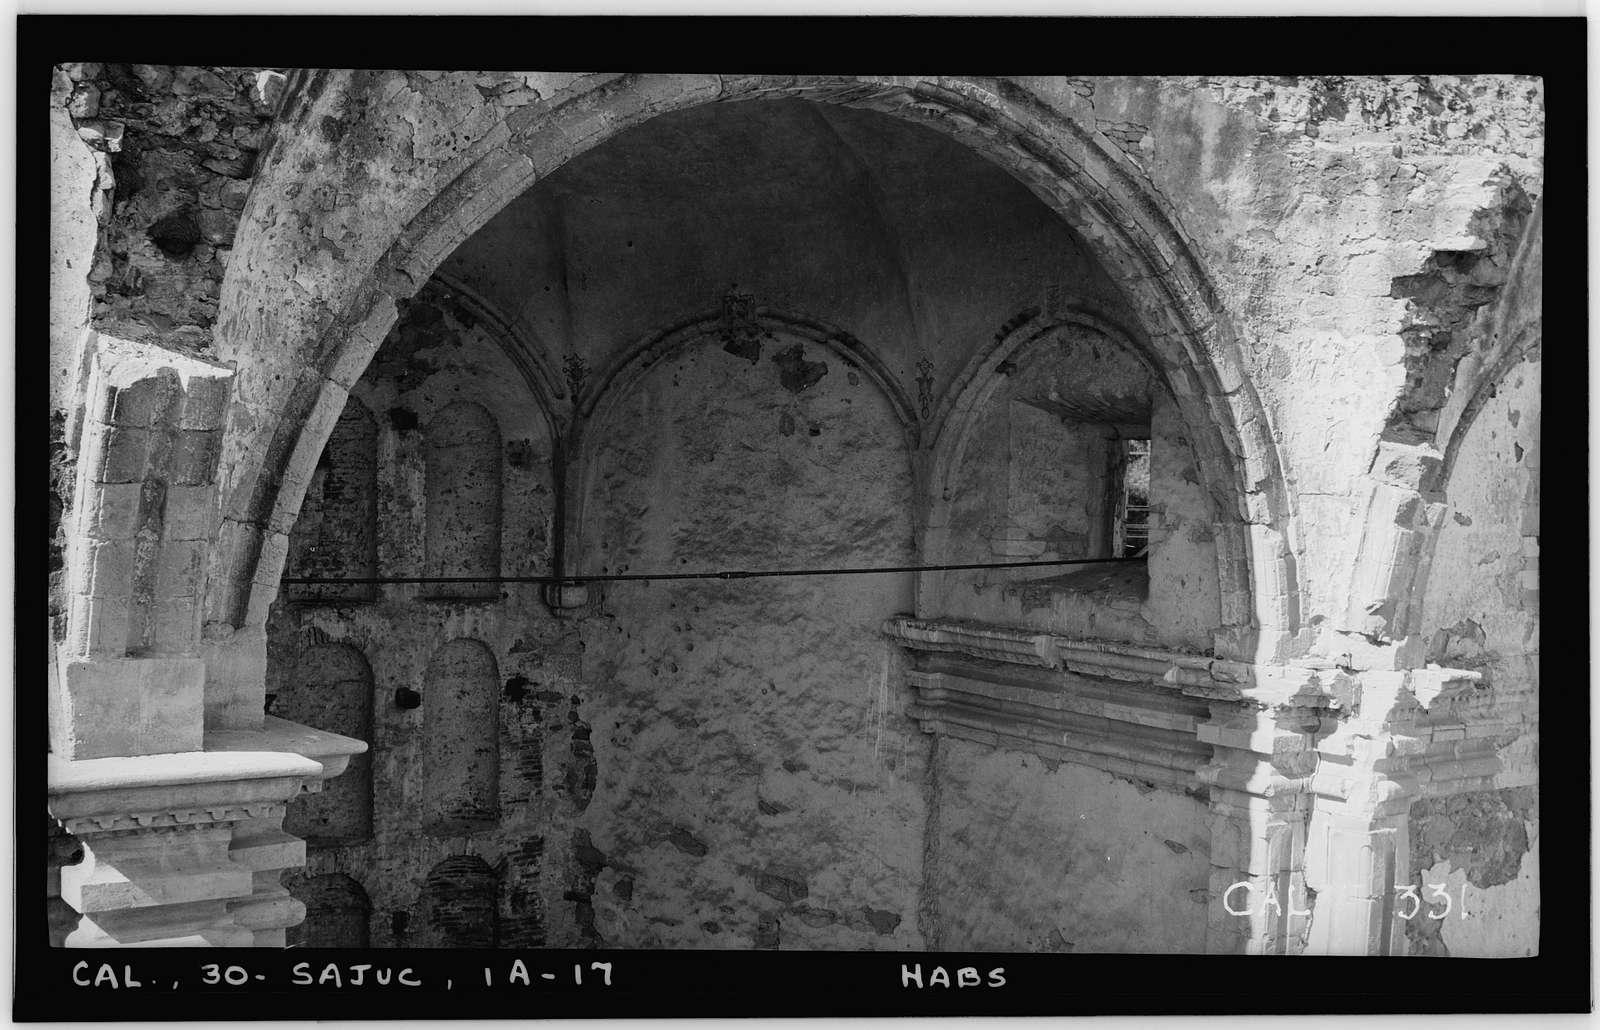 Mission San Juan Capistrano, Stone Church, Olive Street, between U.S. Highway 101 & Main Street, San Juan Capistrano, Orange County, CA